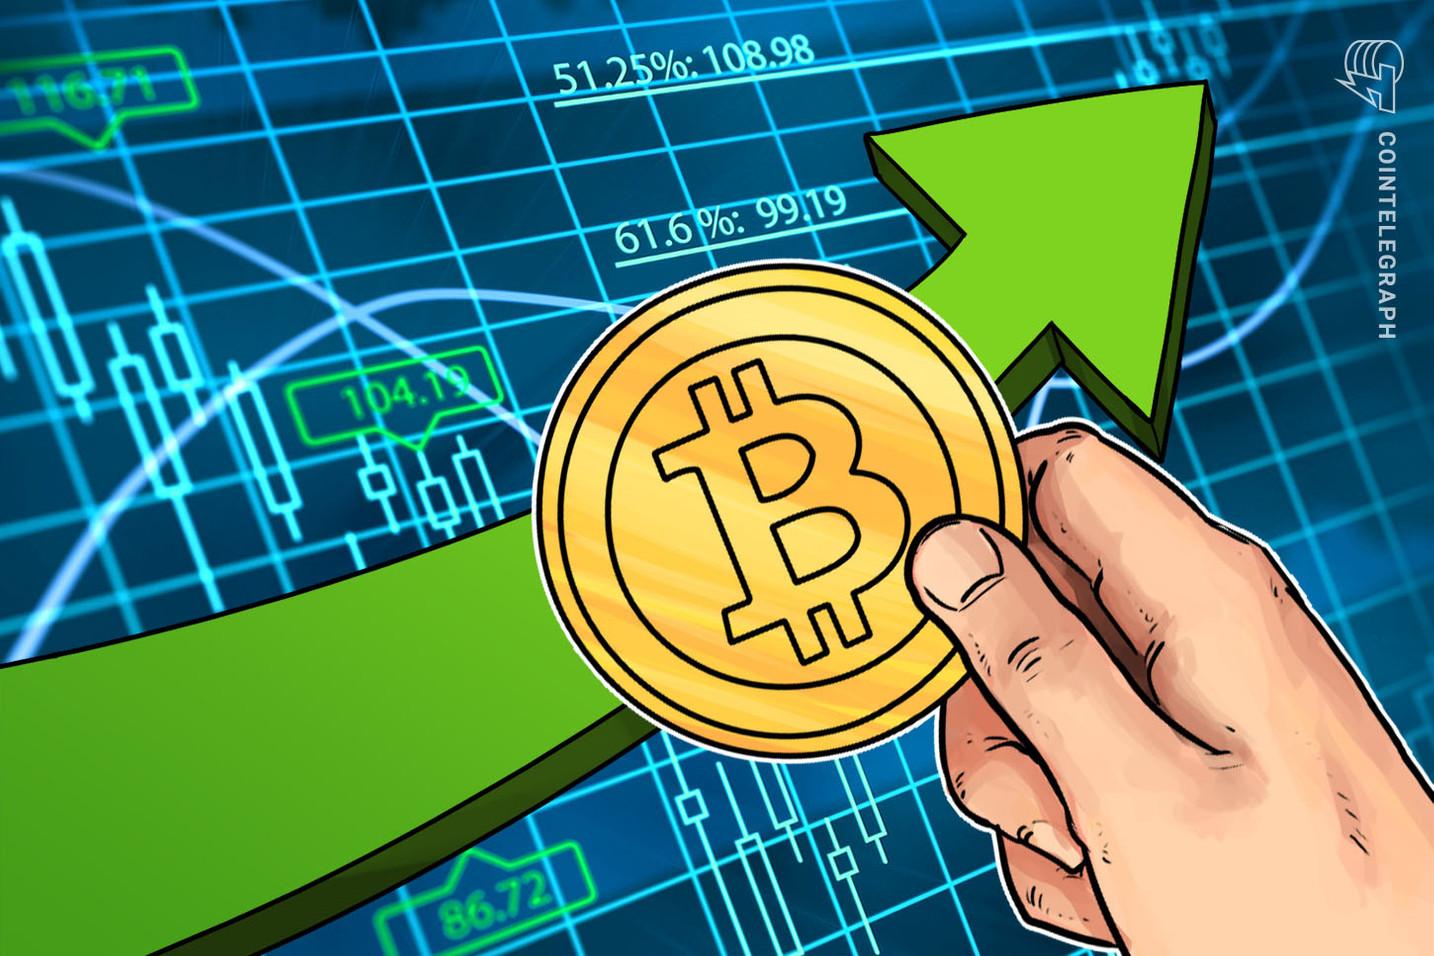 'O Bitcoin vai atingir US$50.000 nos próximos 18 meses' afirma analista da eToro Simon Peters